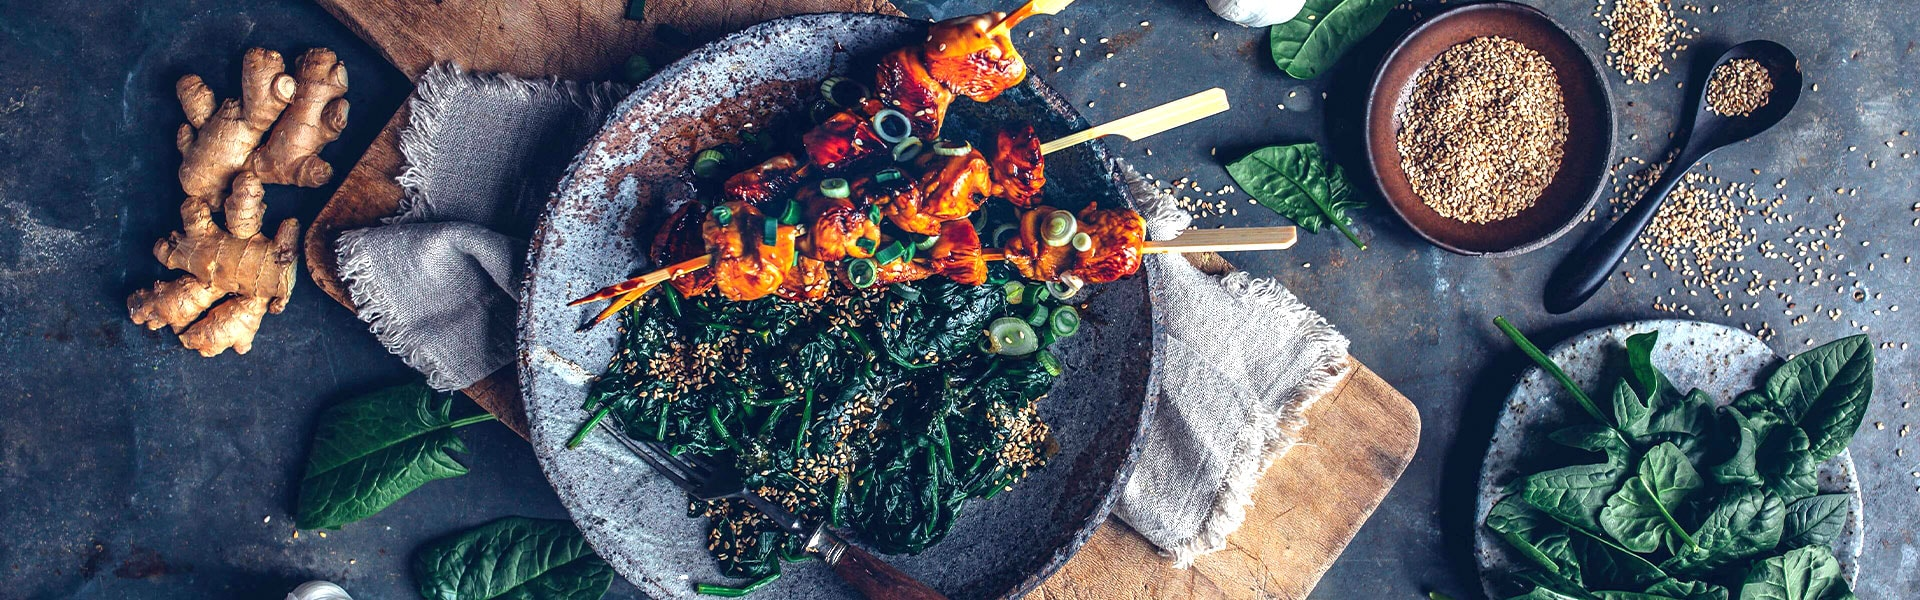 Yakitori-Spieße mit Spinat-Sesam-Salat